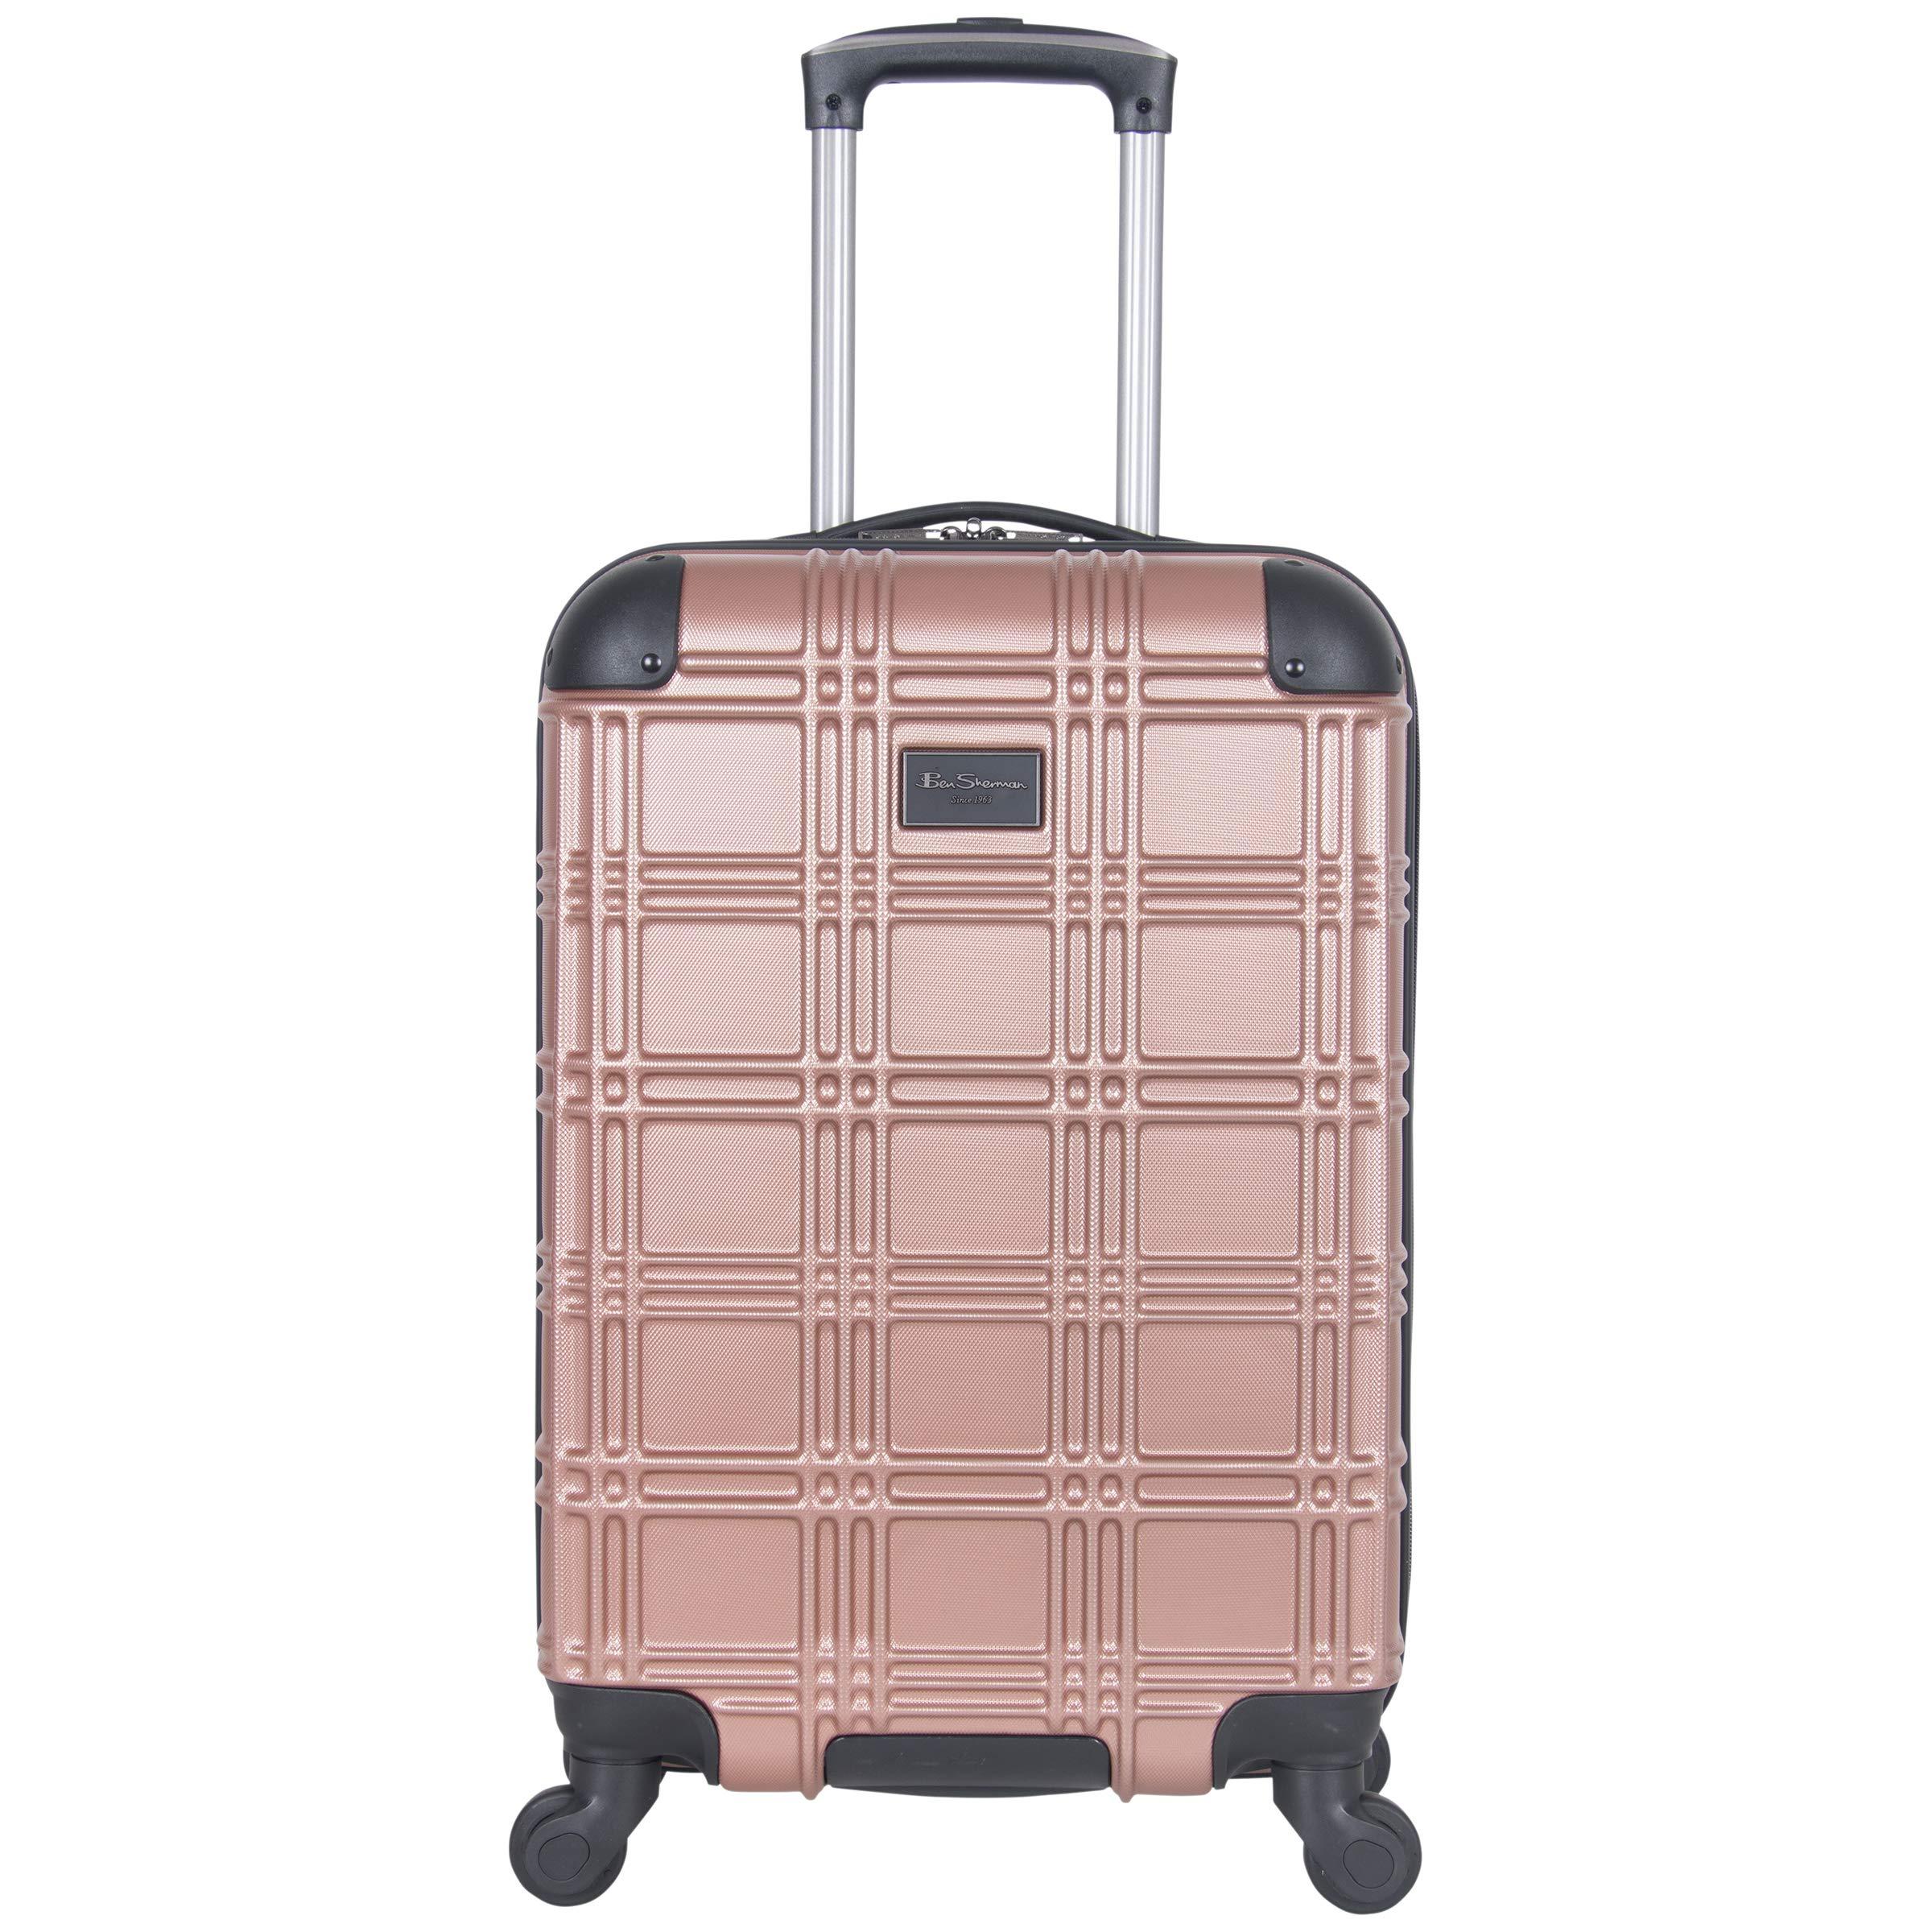 Ben Sherman Luggage Nottingham 20'' Embossed PAP 4-Wheel Carry-On